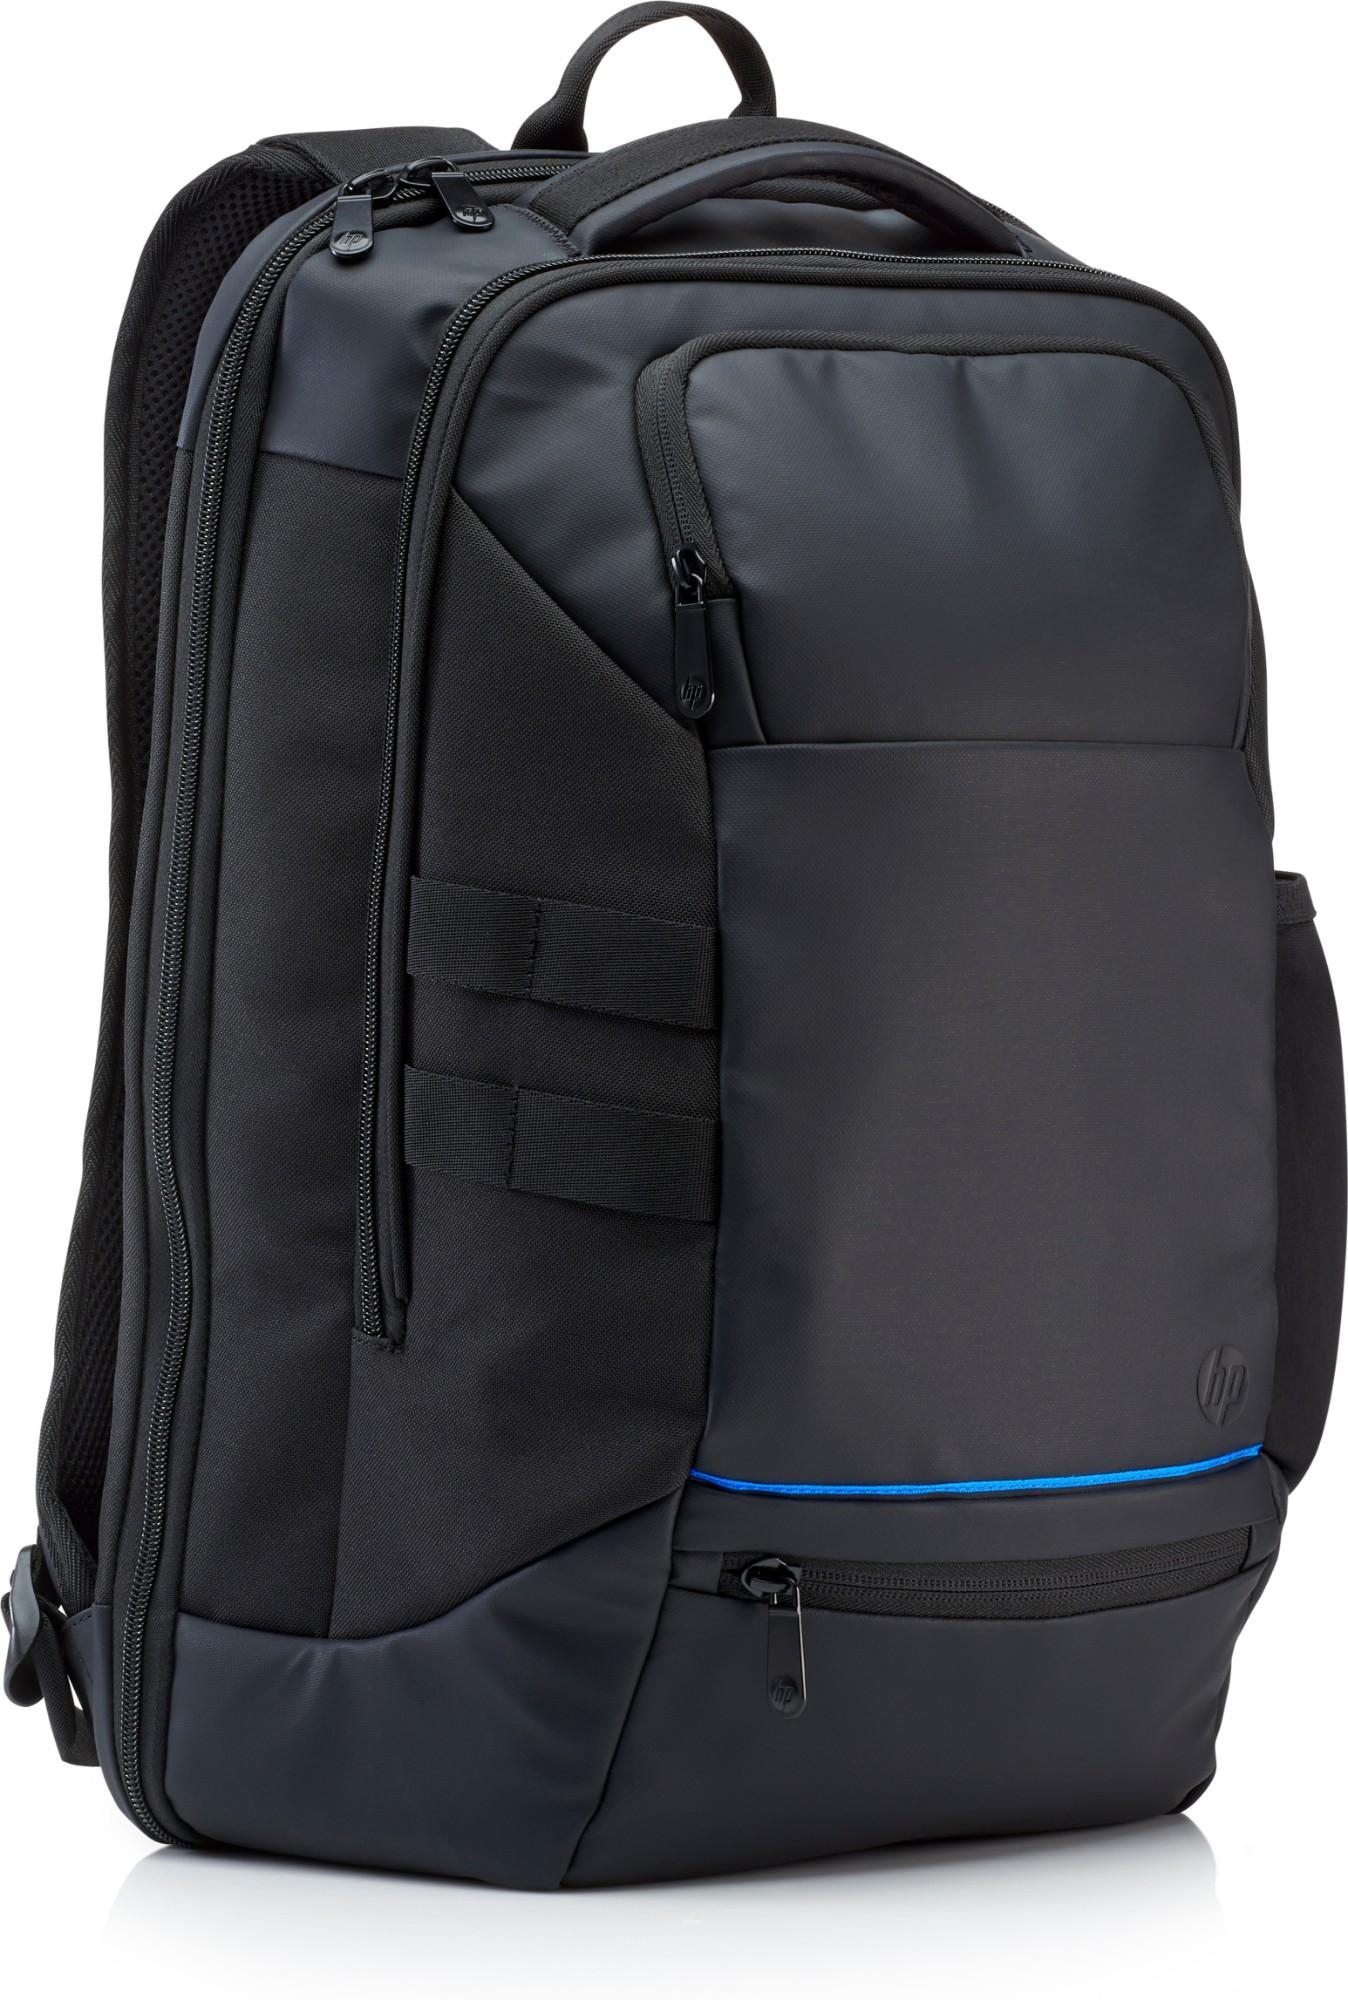 HP Recycled rugzak Polyvinyl Butyral (PVB), Polyethyleentereftalaat (PET) Zwart